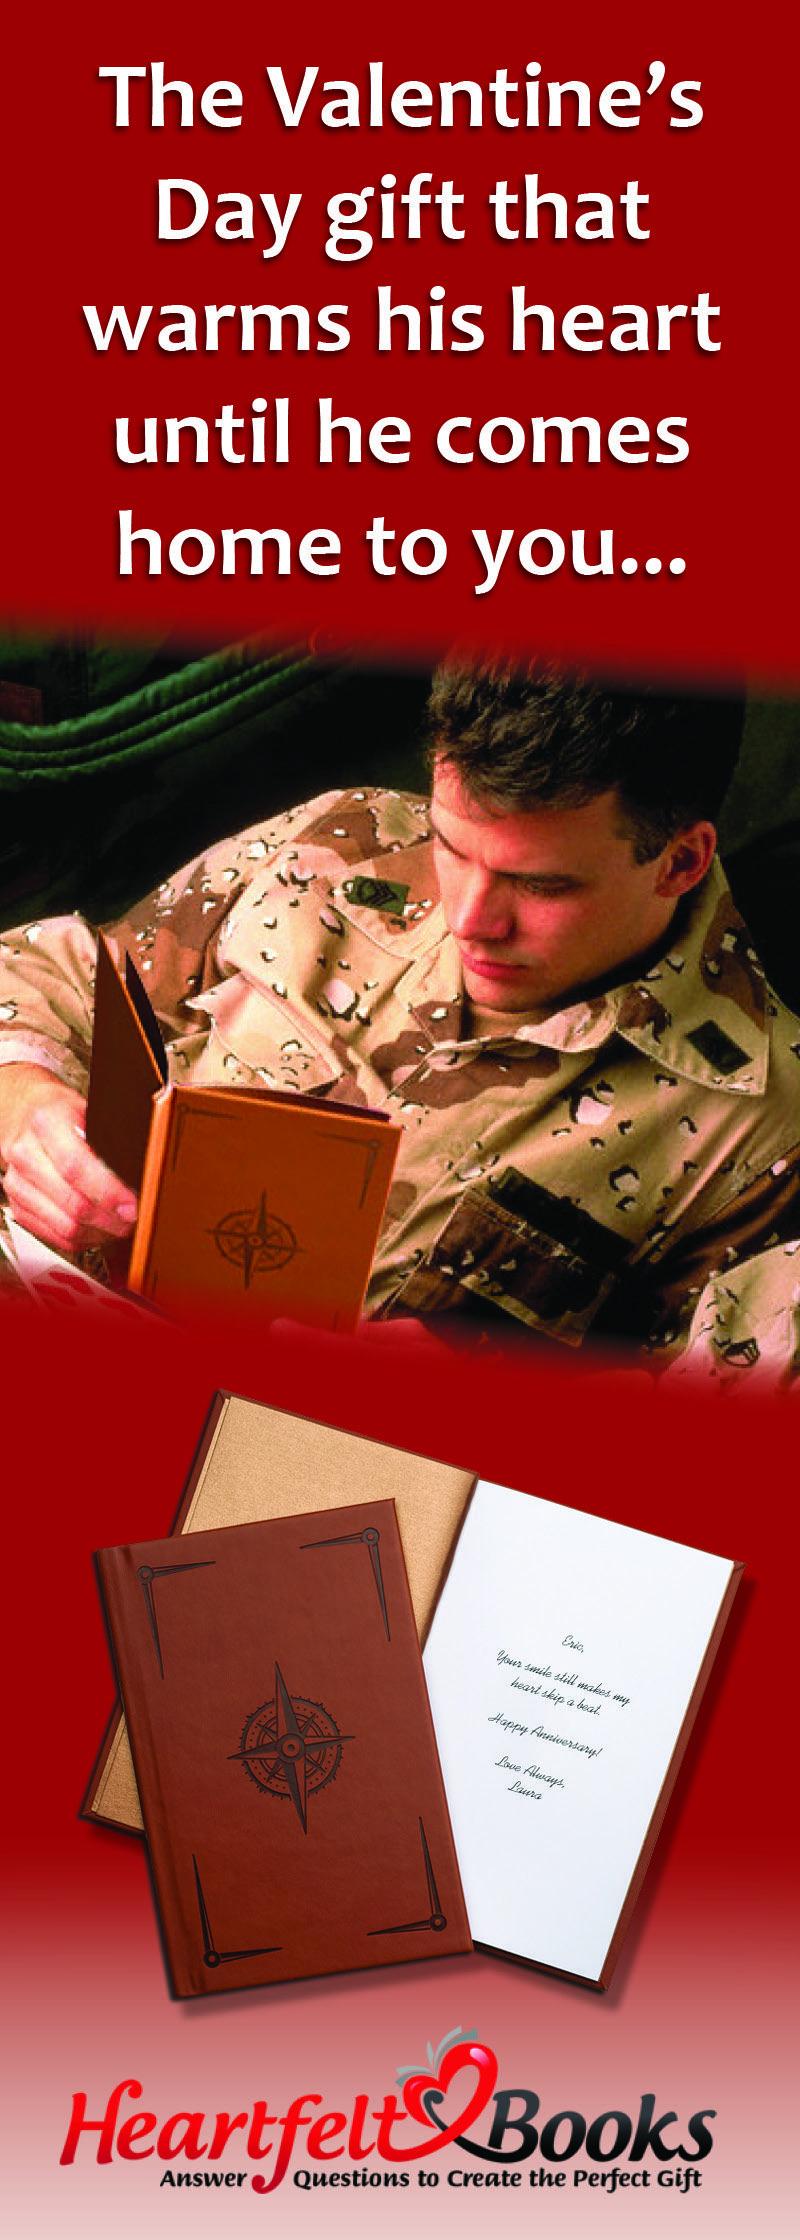 Gift For Deployed Husband Or Boyfriend Heartfeltbooks Com Deployed Husband Gifts Heartfelt Books